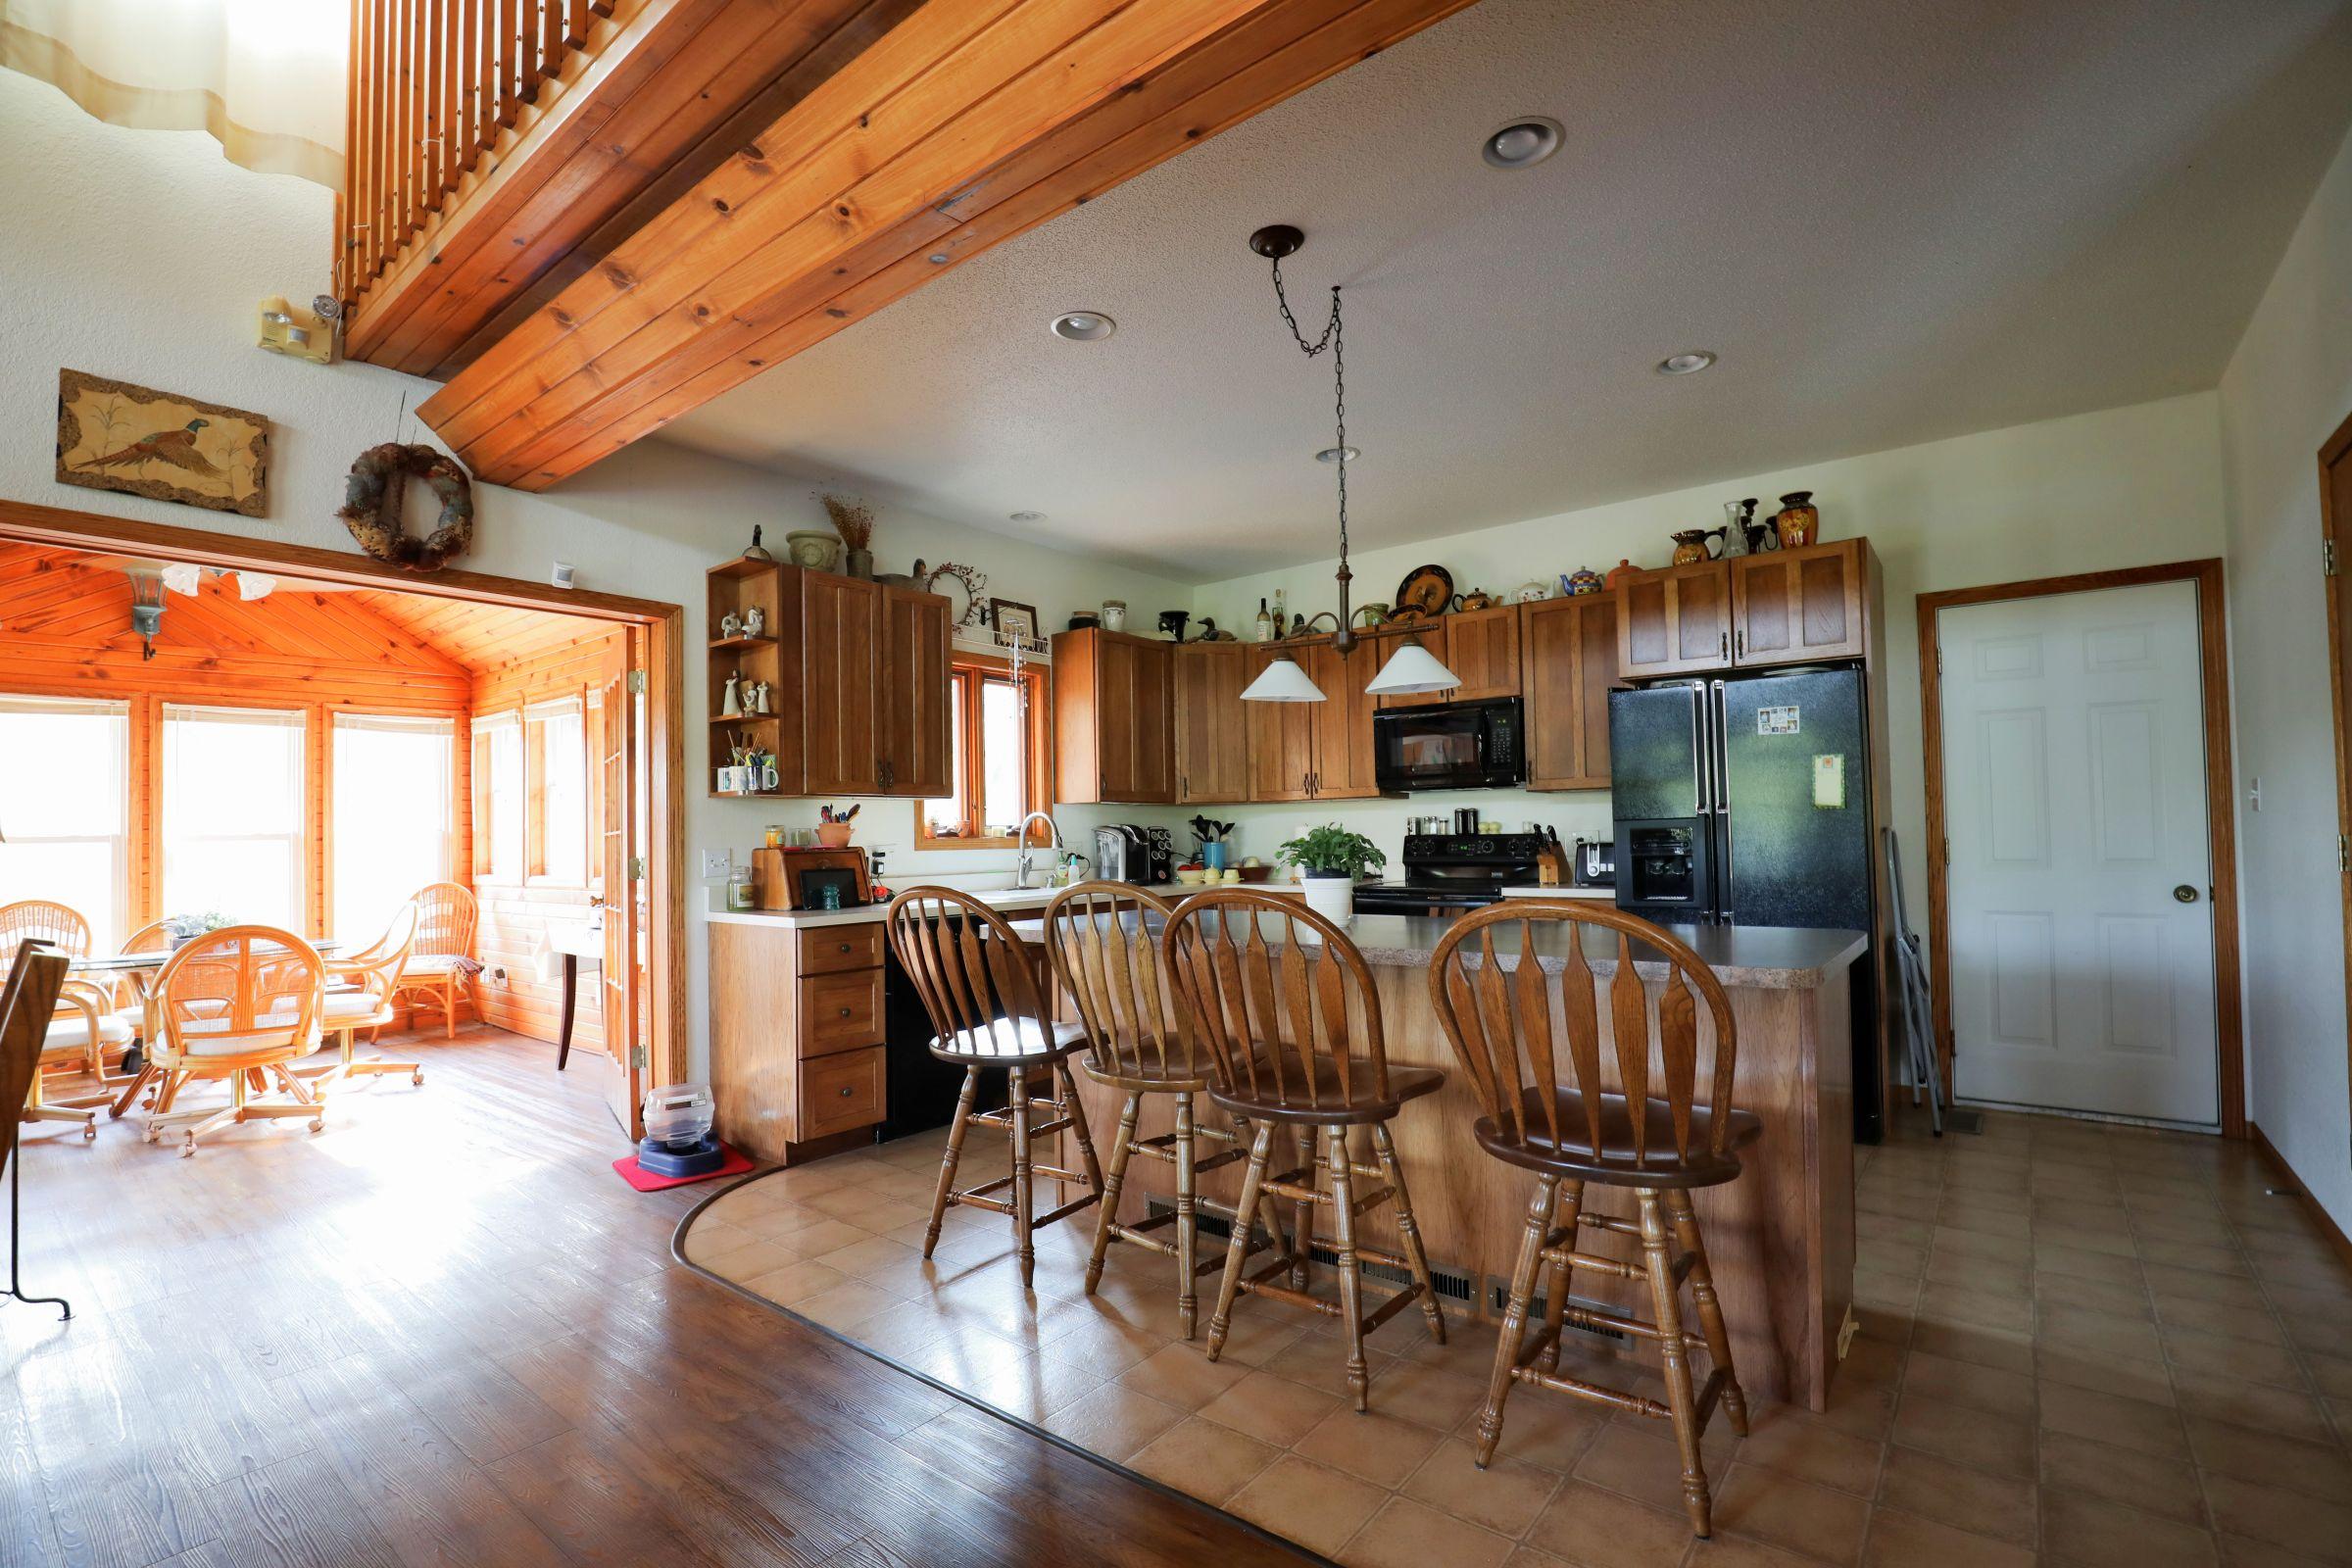 land-lee-county-iowa-328-acres-listing-number-15137-5-2020-08-27-174410.jpg